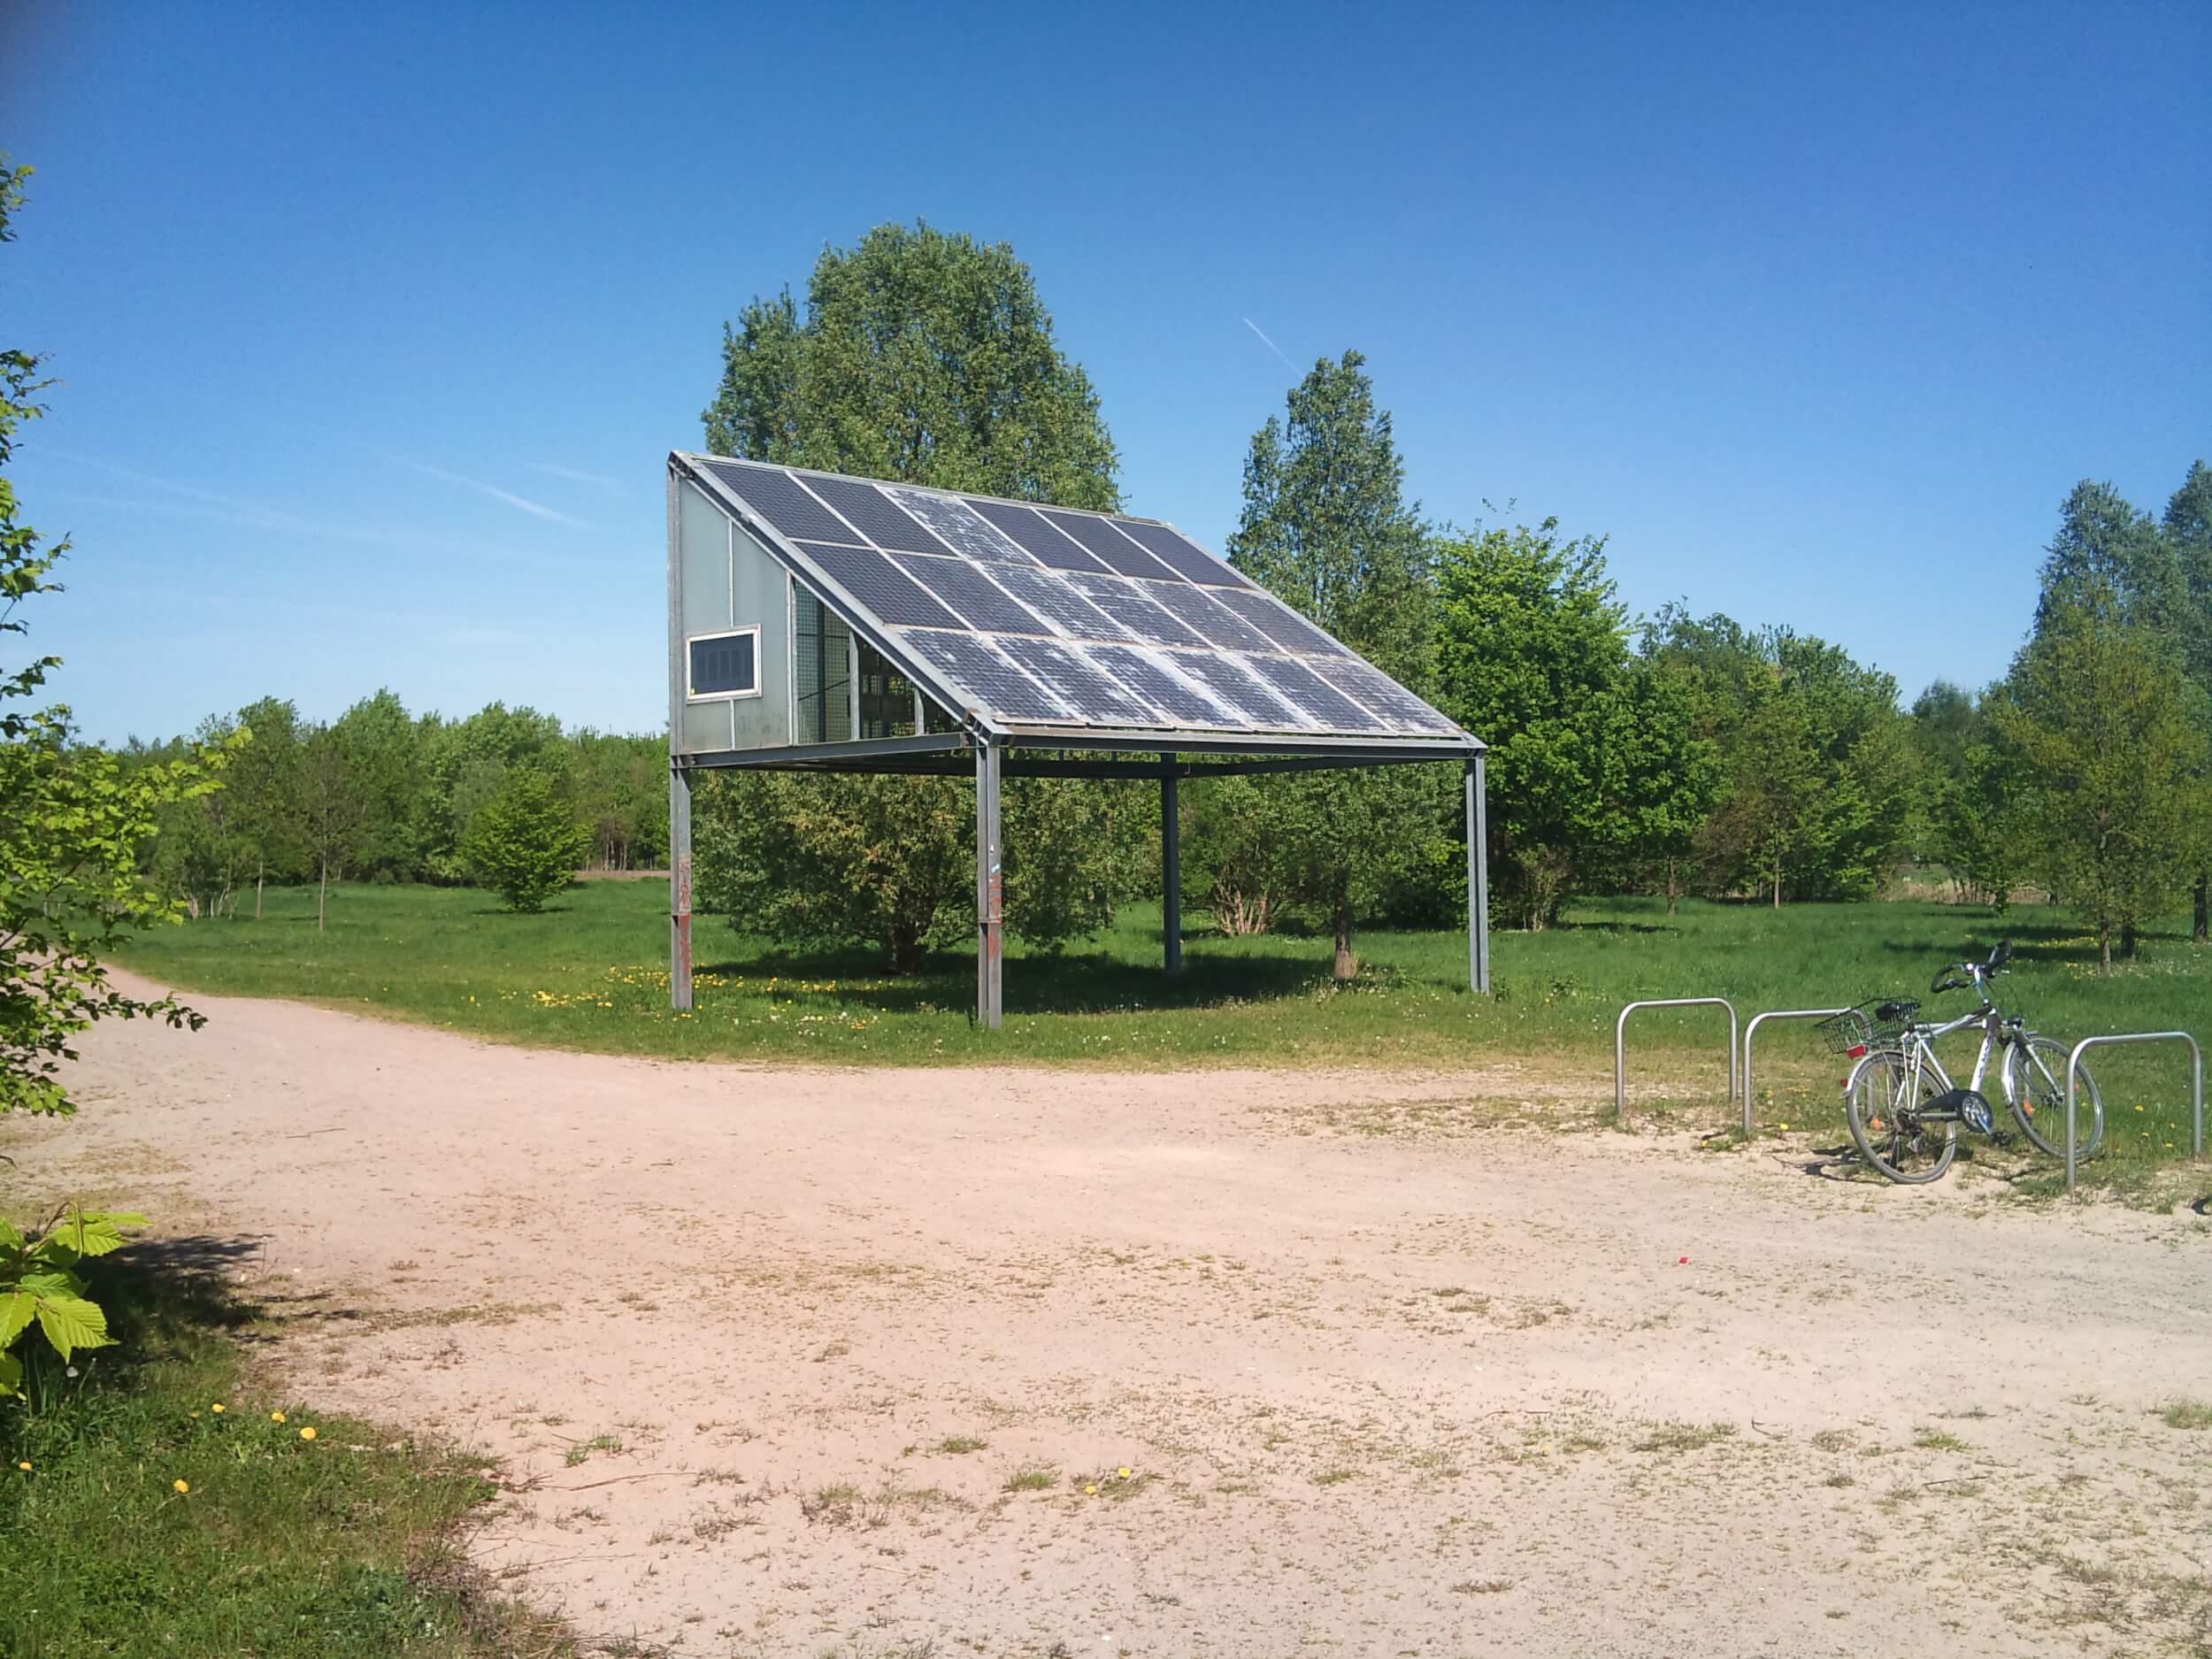 Solardach (c) familienfreund.de